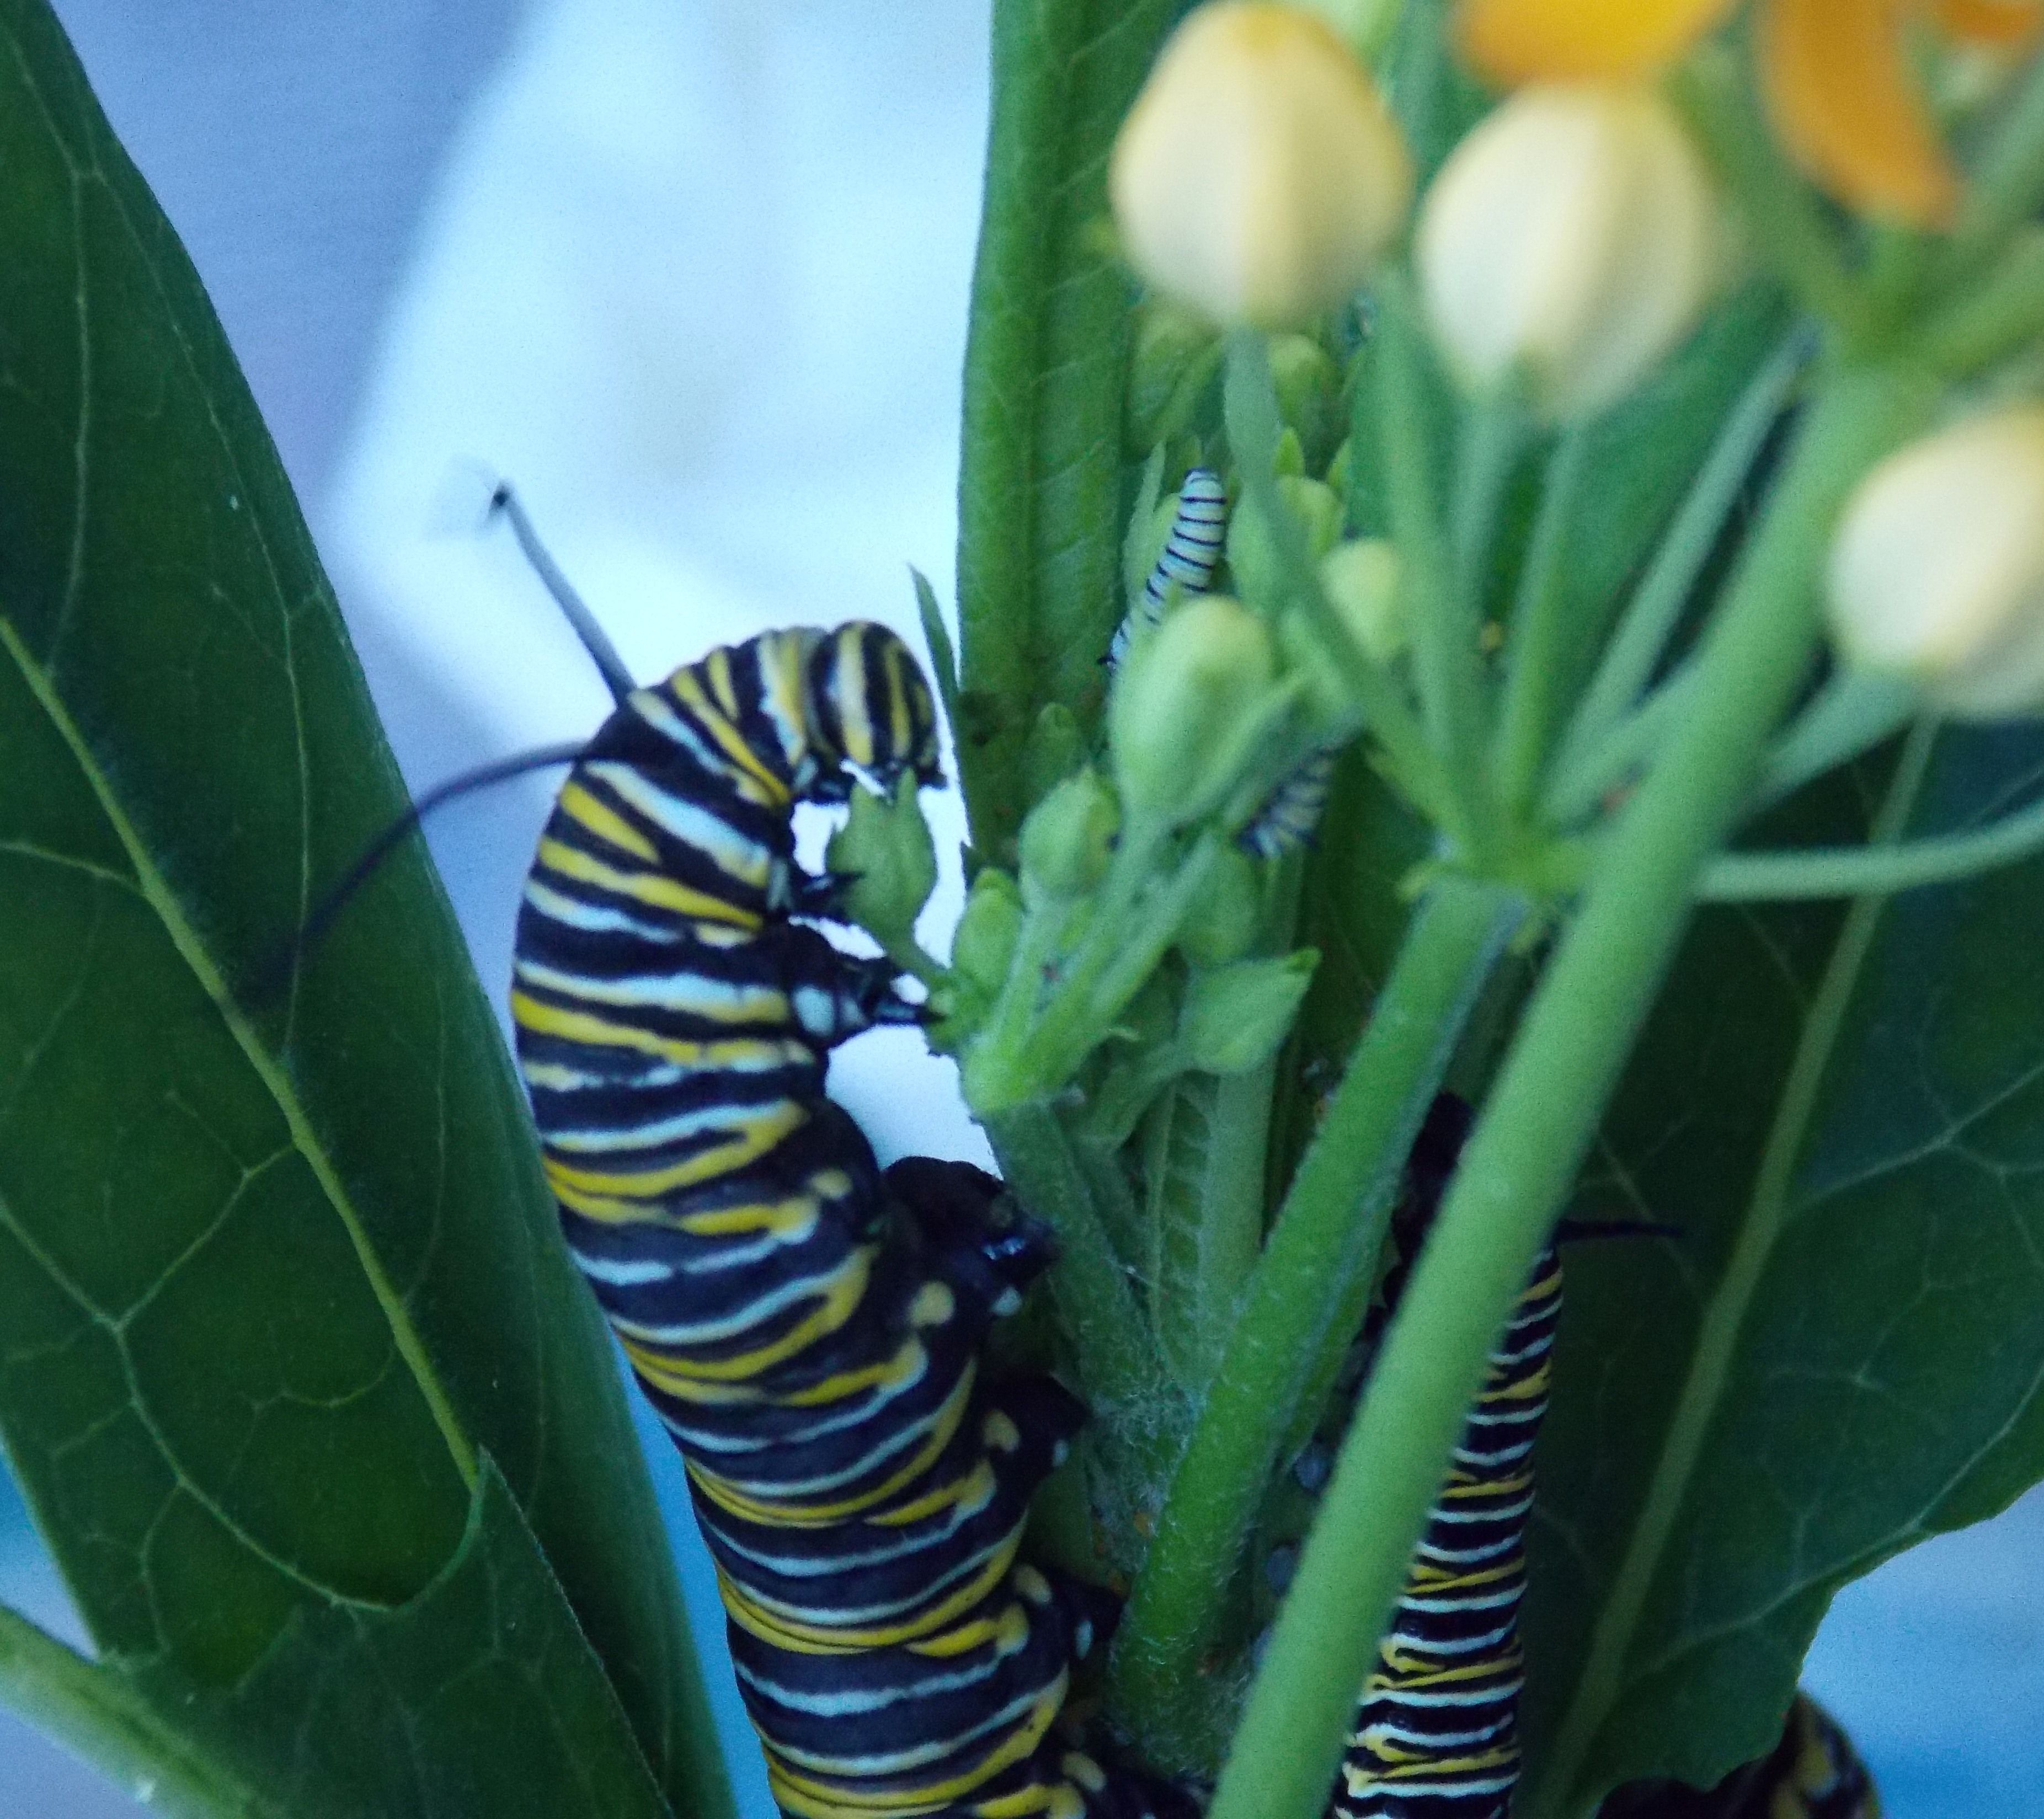 Monarch Caterpillar eating milkweed Monarch caterpillar